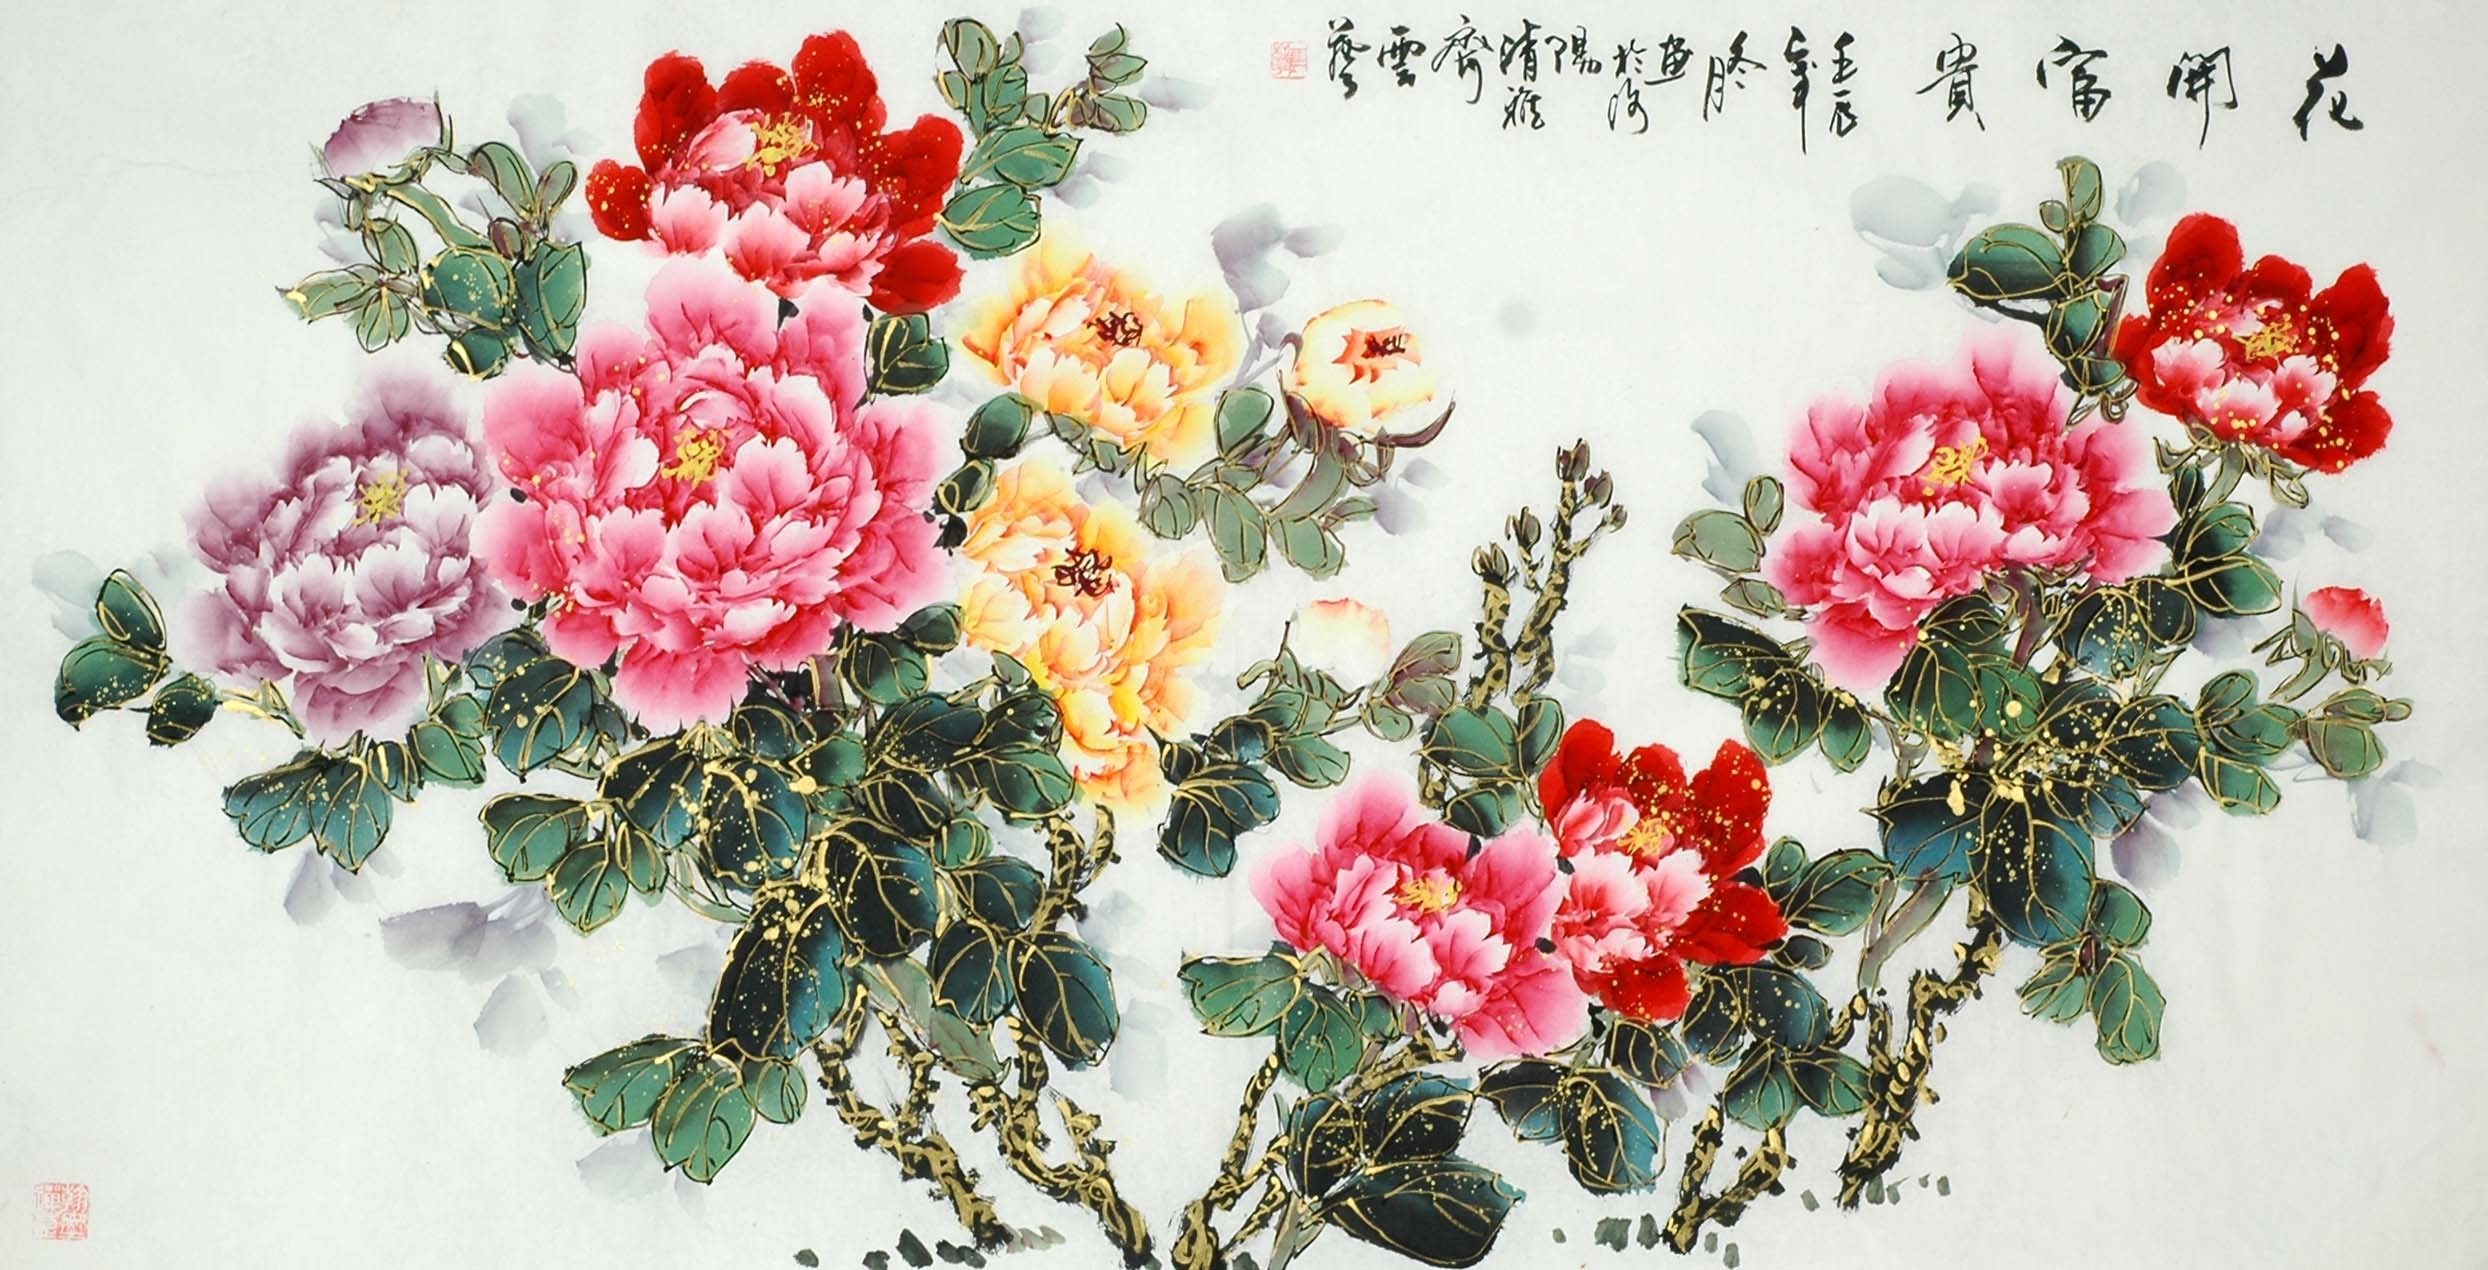 Chinese Peony Painting - CNAG010282